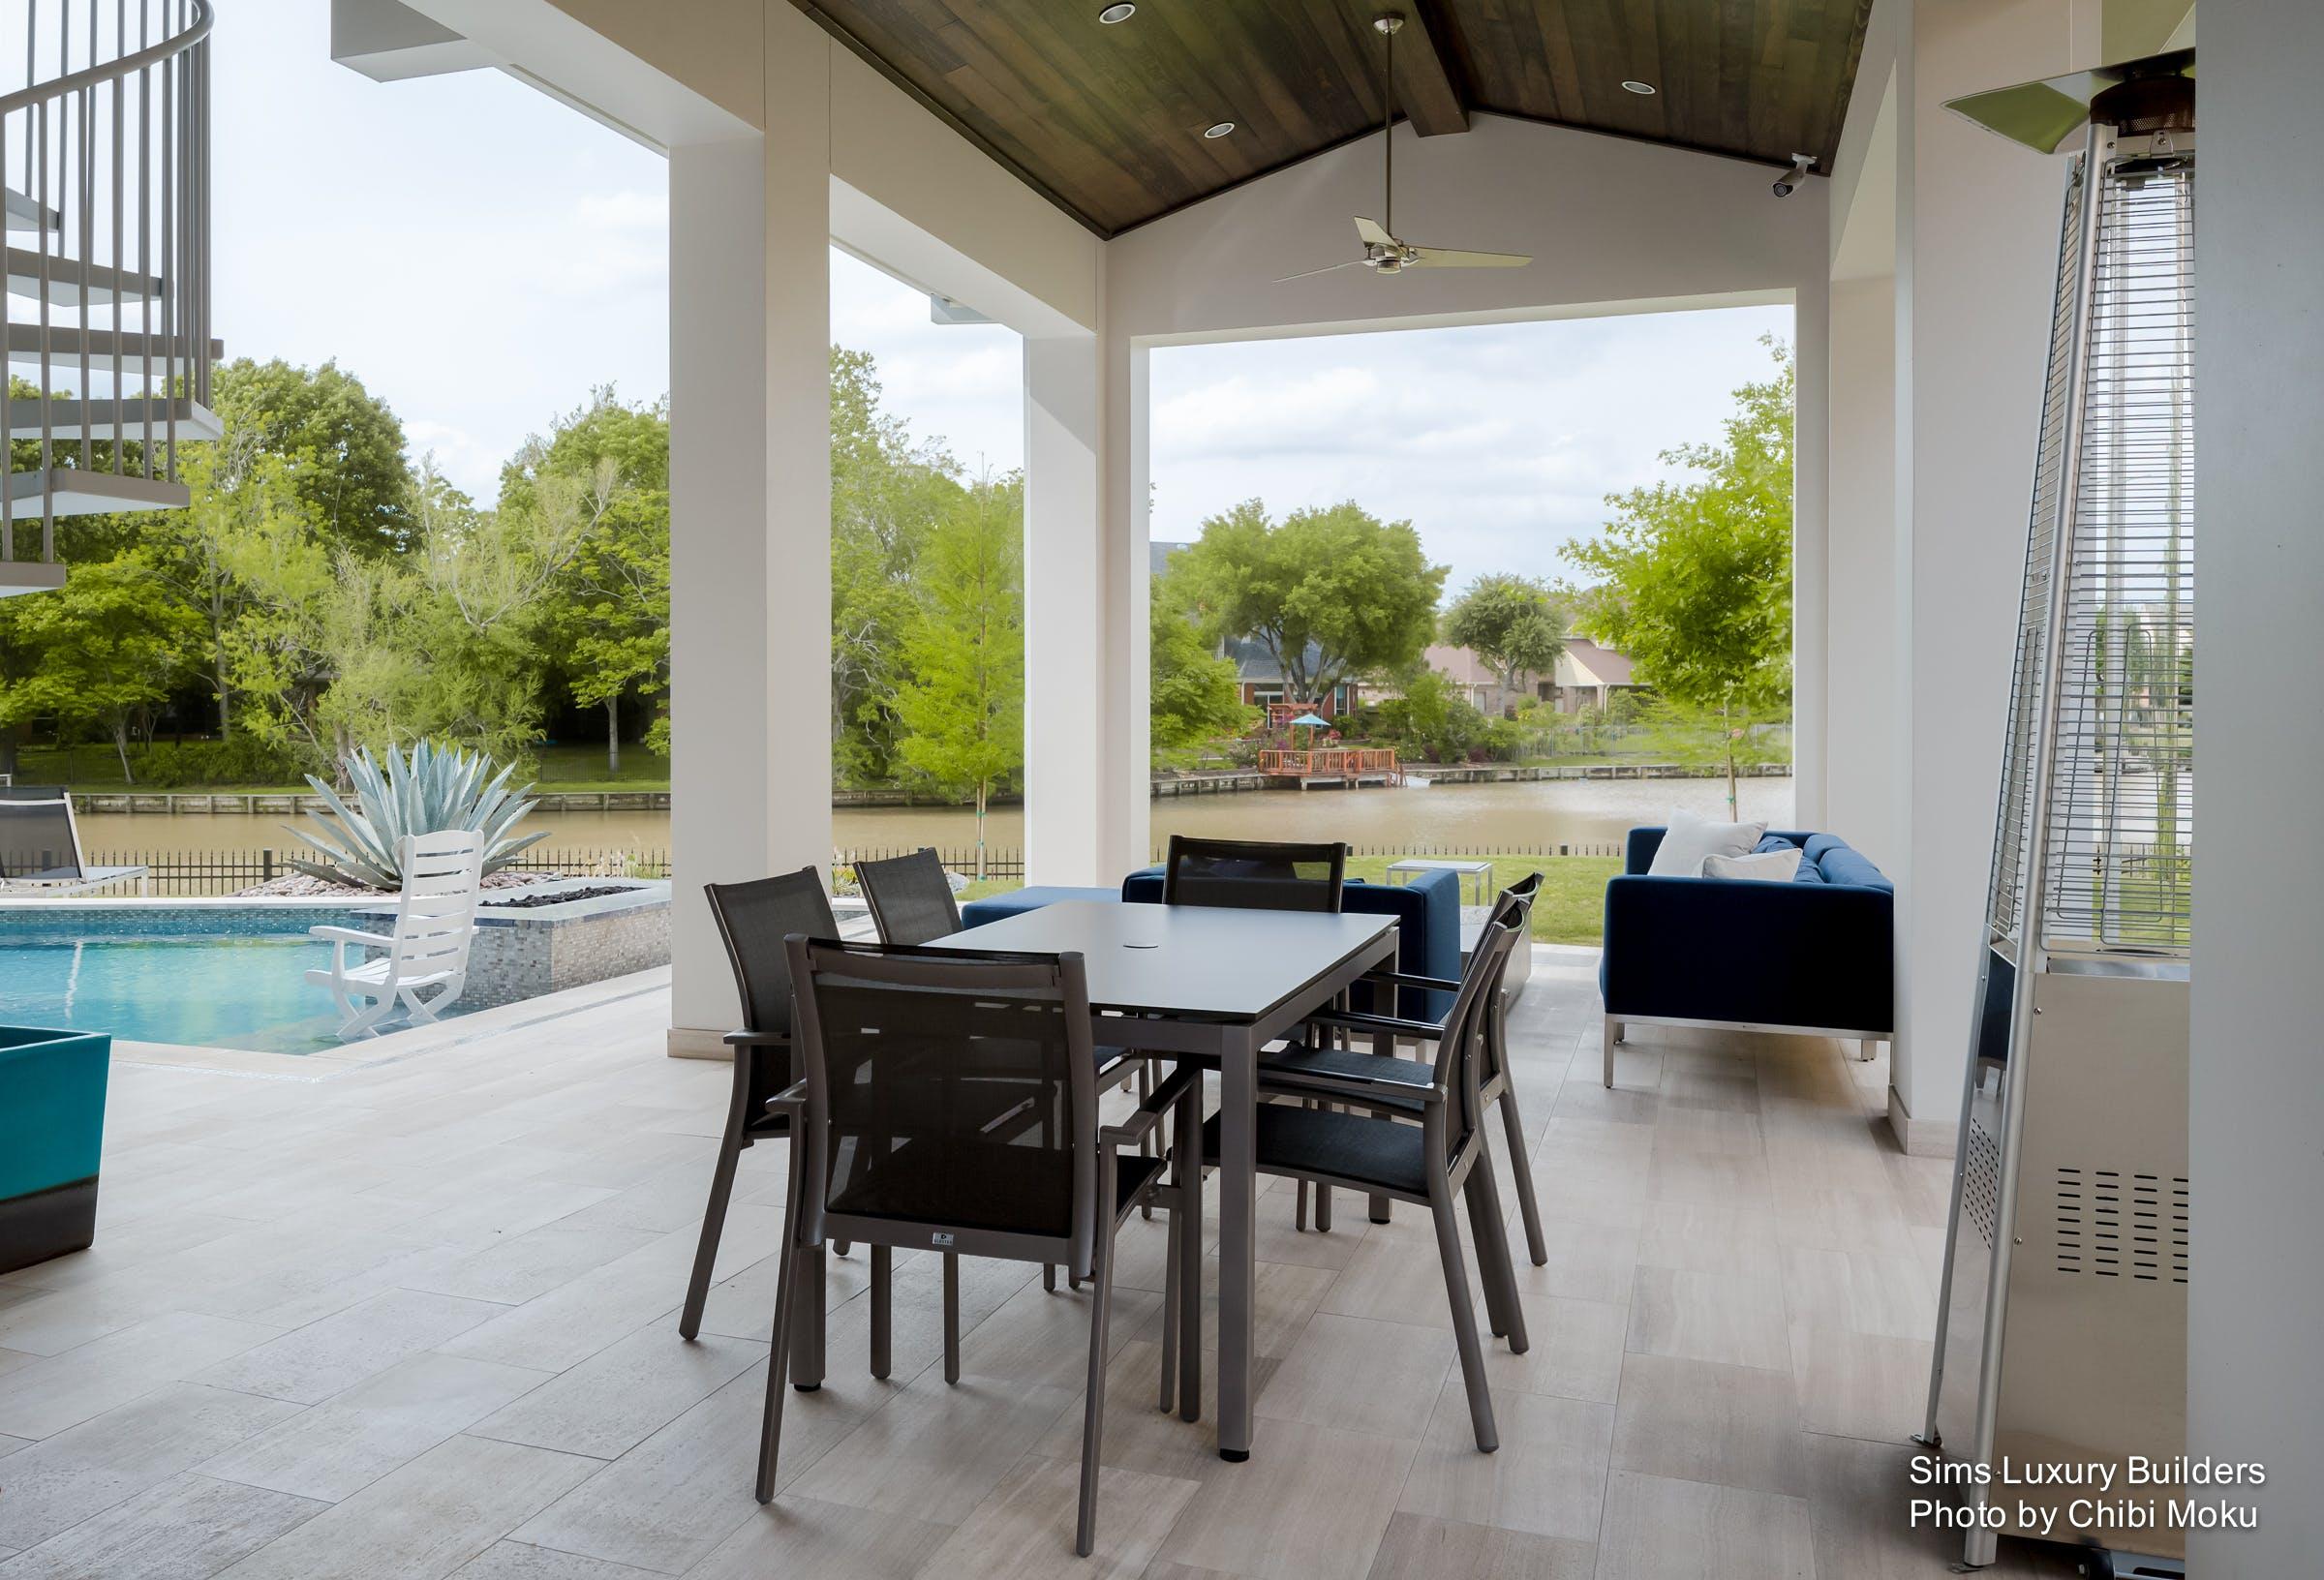 House design documentary - Interior Design Photographer Architecture Videographer Green Design Photos Interior Design Documentary Landscape